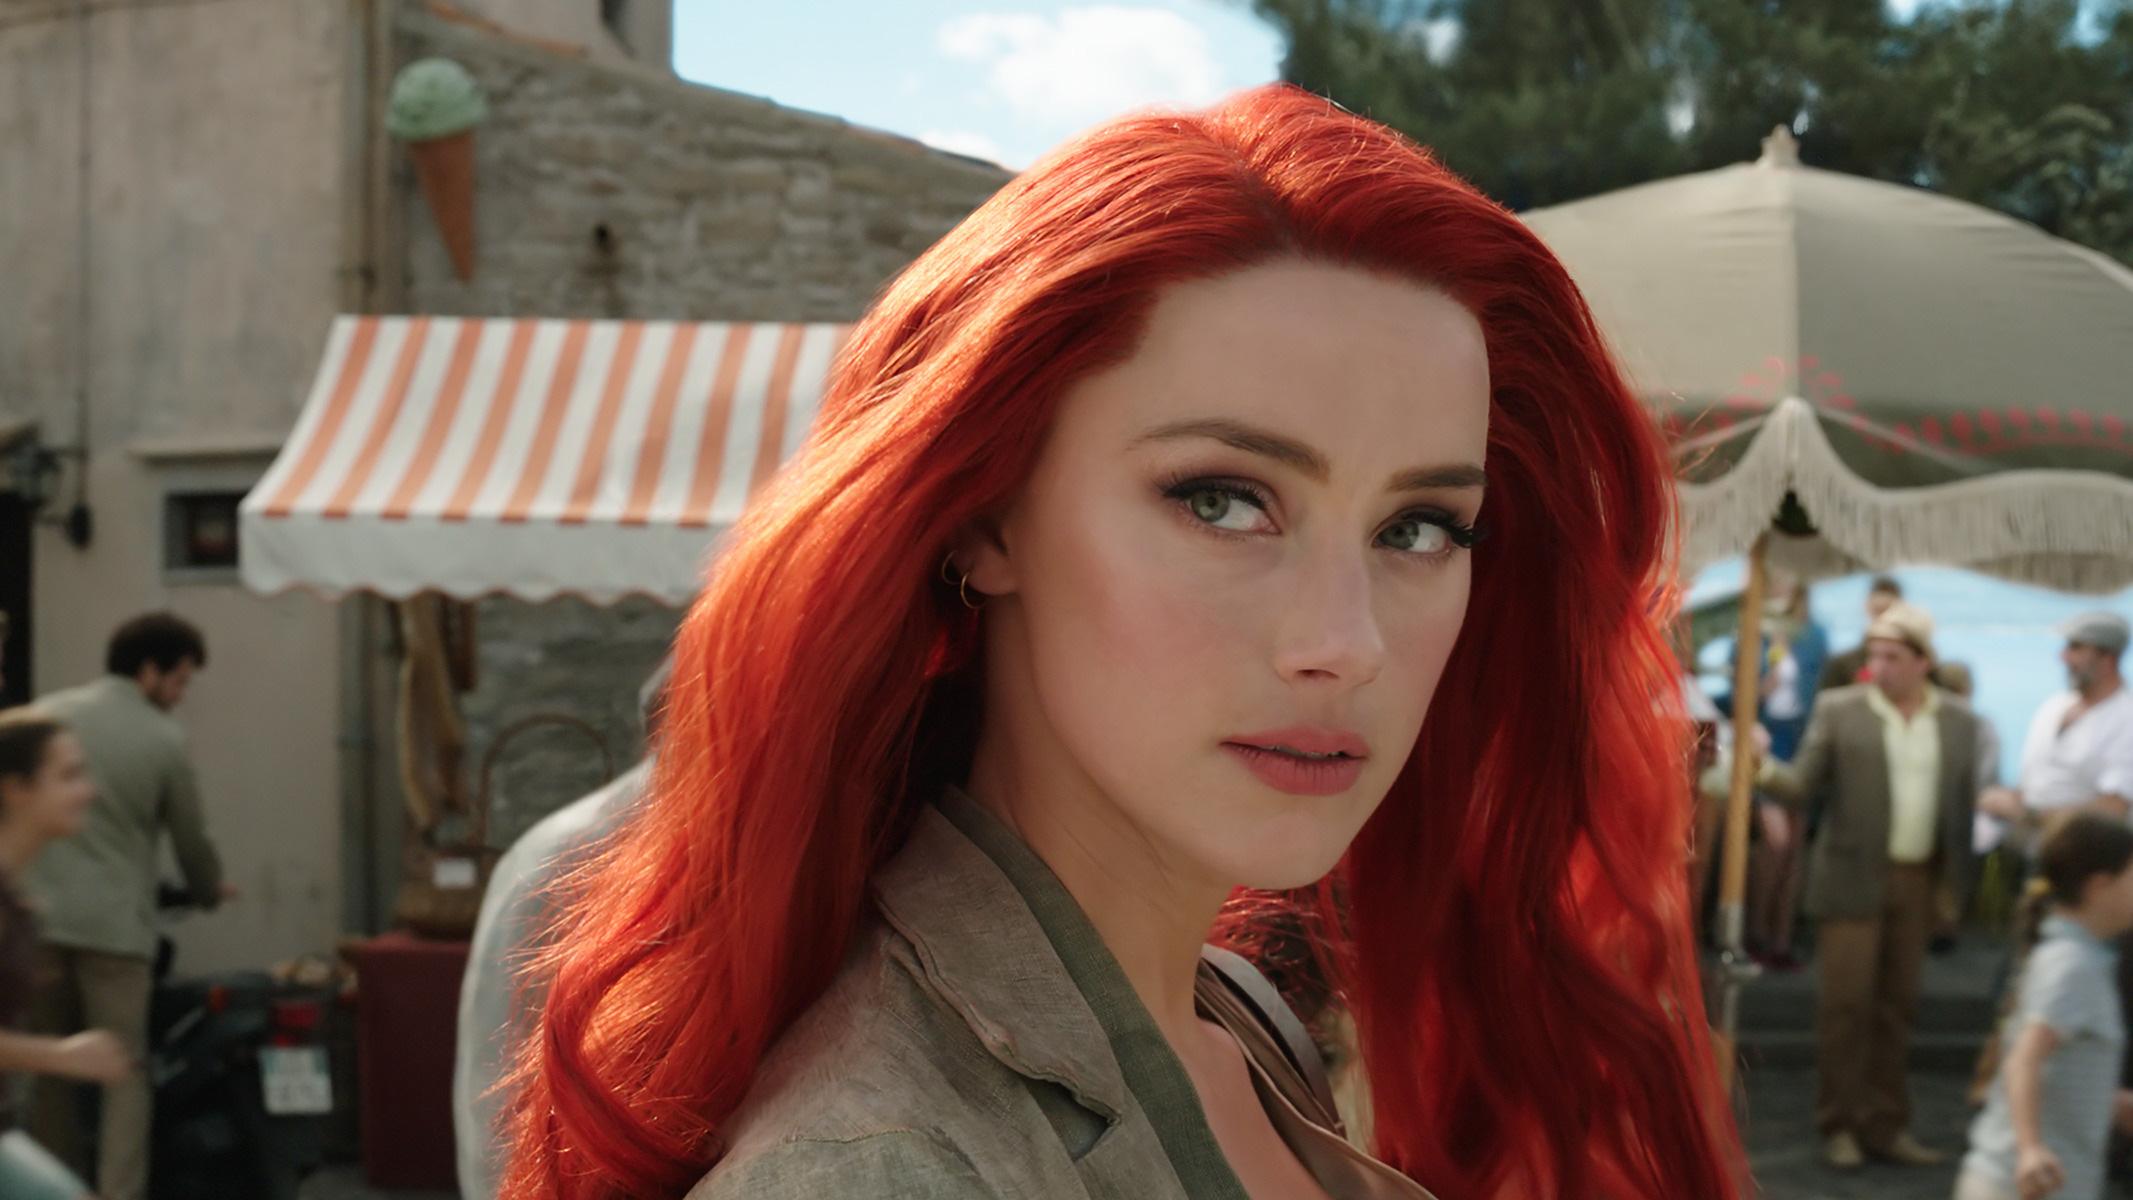 Amber Heard Mera Aquaman Movie Hd Movies 4k Wallpapers Images